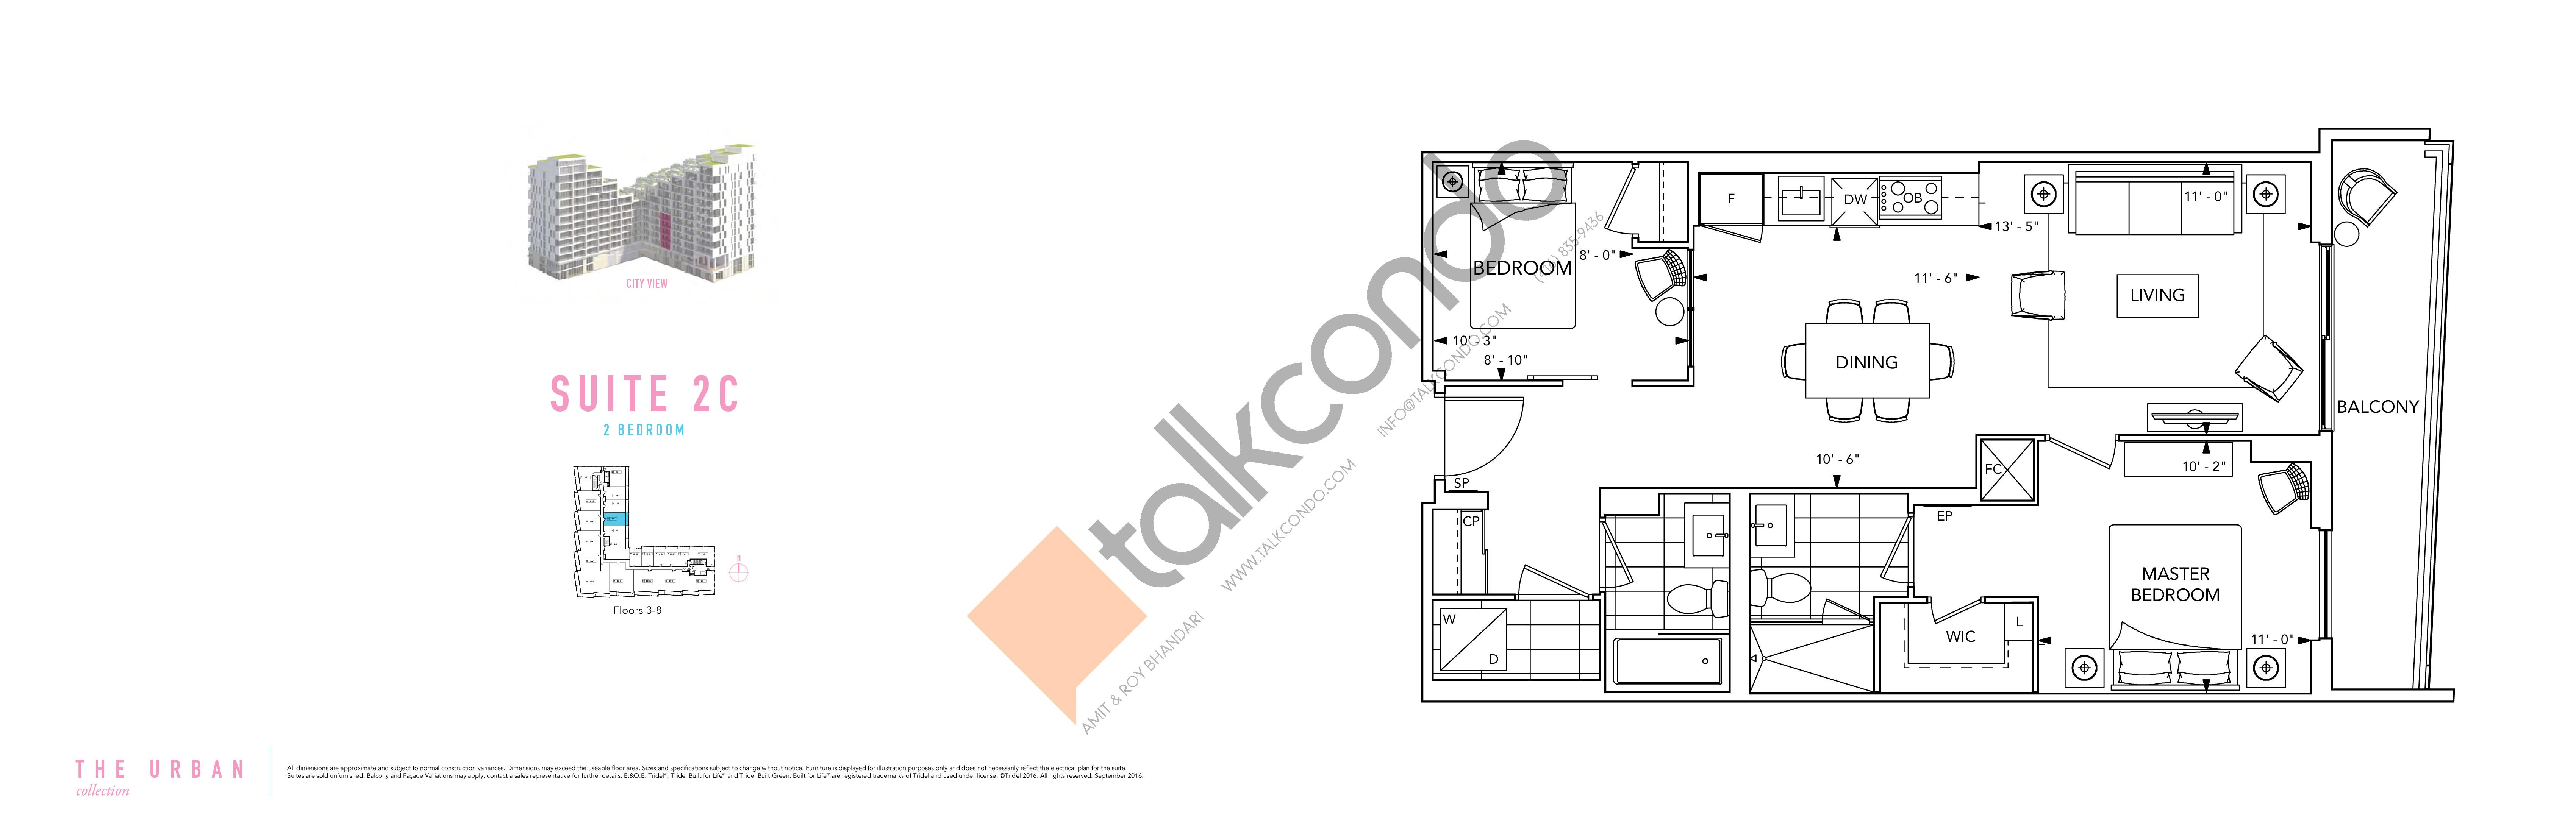 Suite 2C Floor Plan at Aquabella Condos - 809 sq.ft